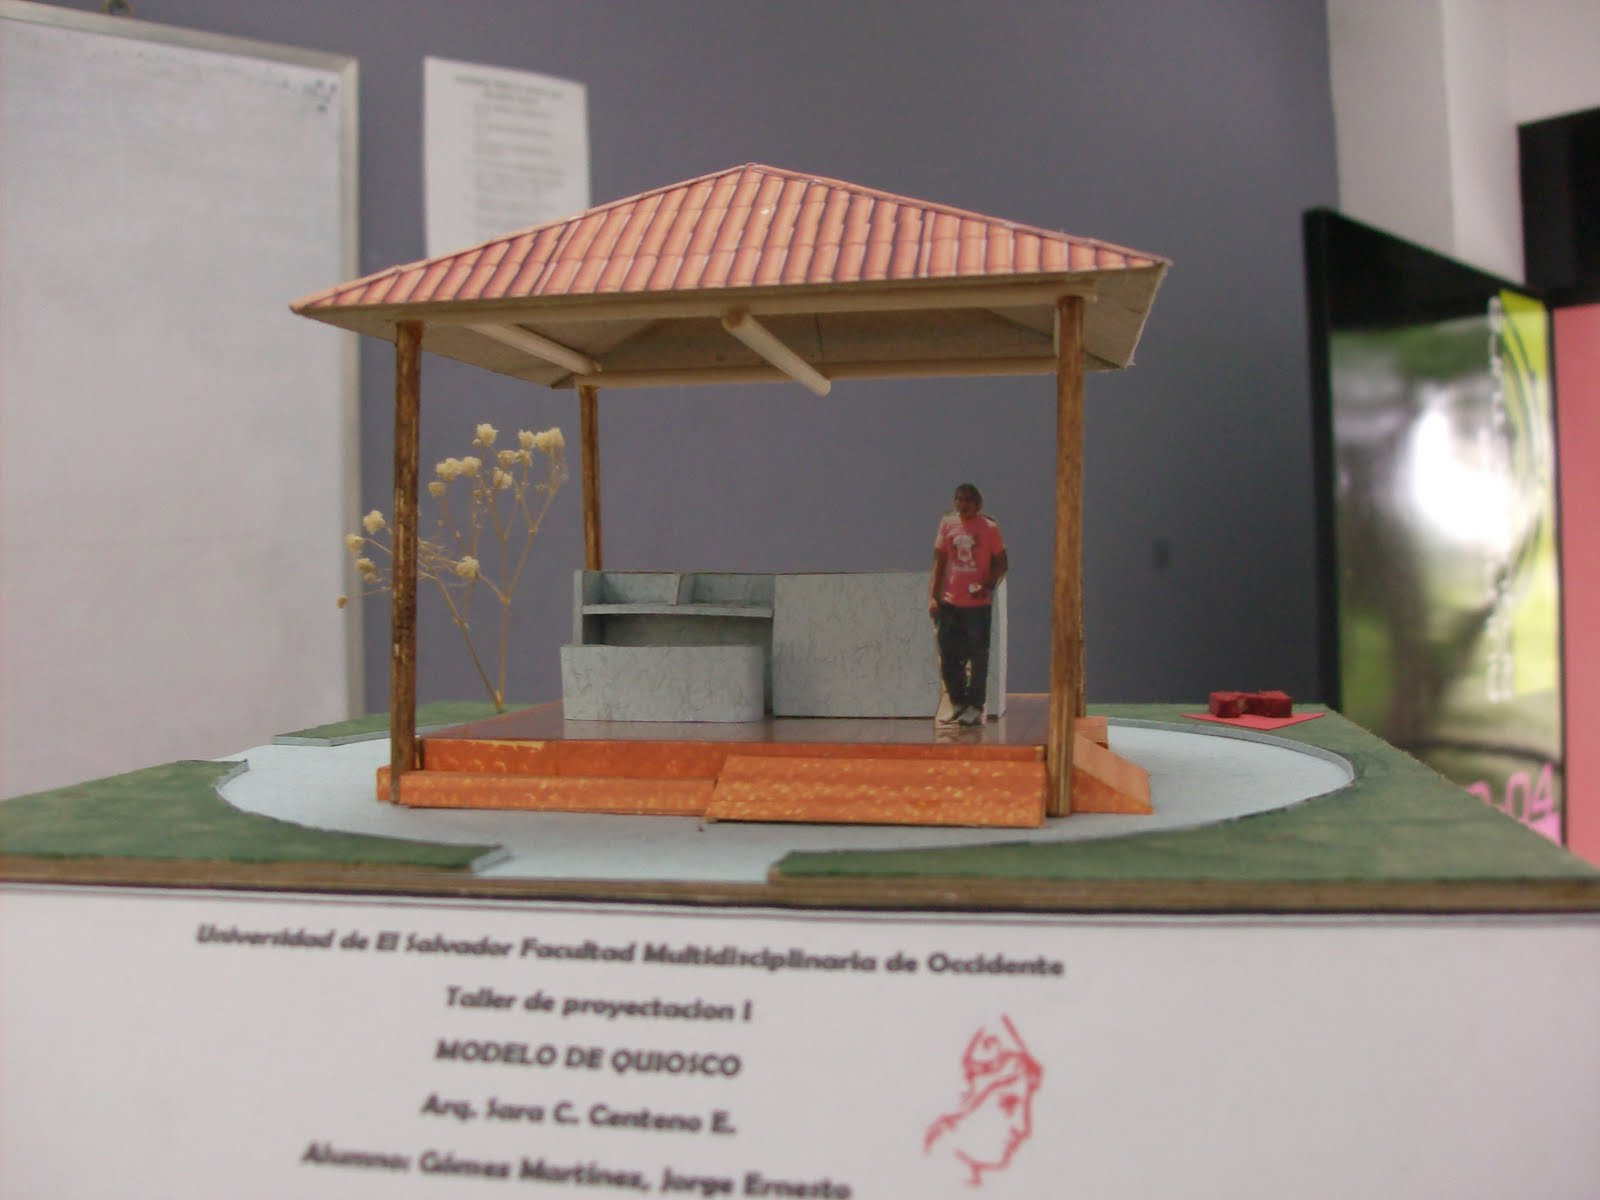 Arquitectura en construccion maquetas de quiosco y contenedor for Como construir un kiosco en madera